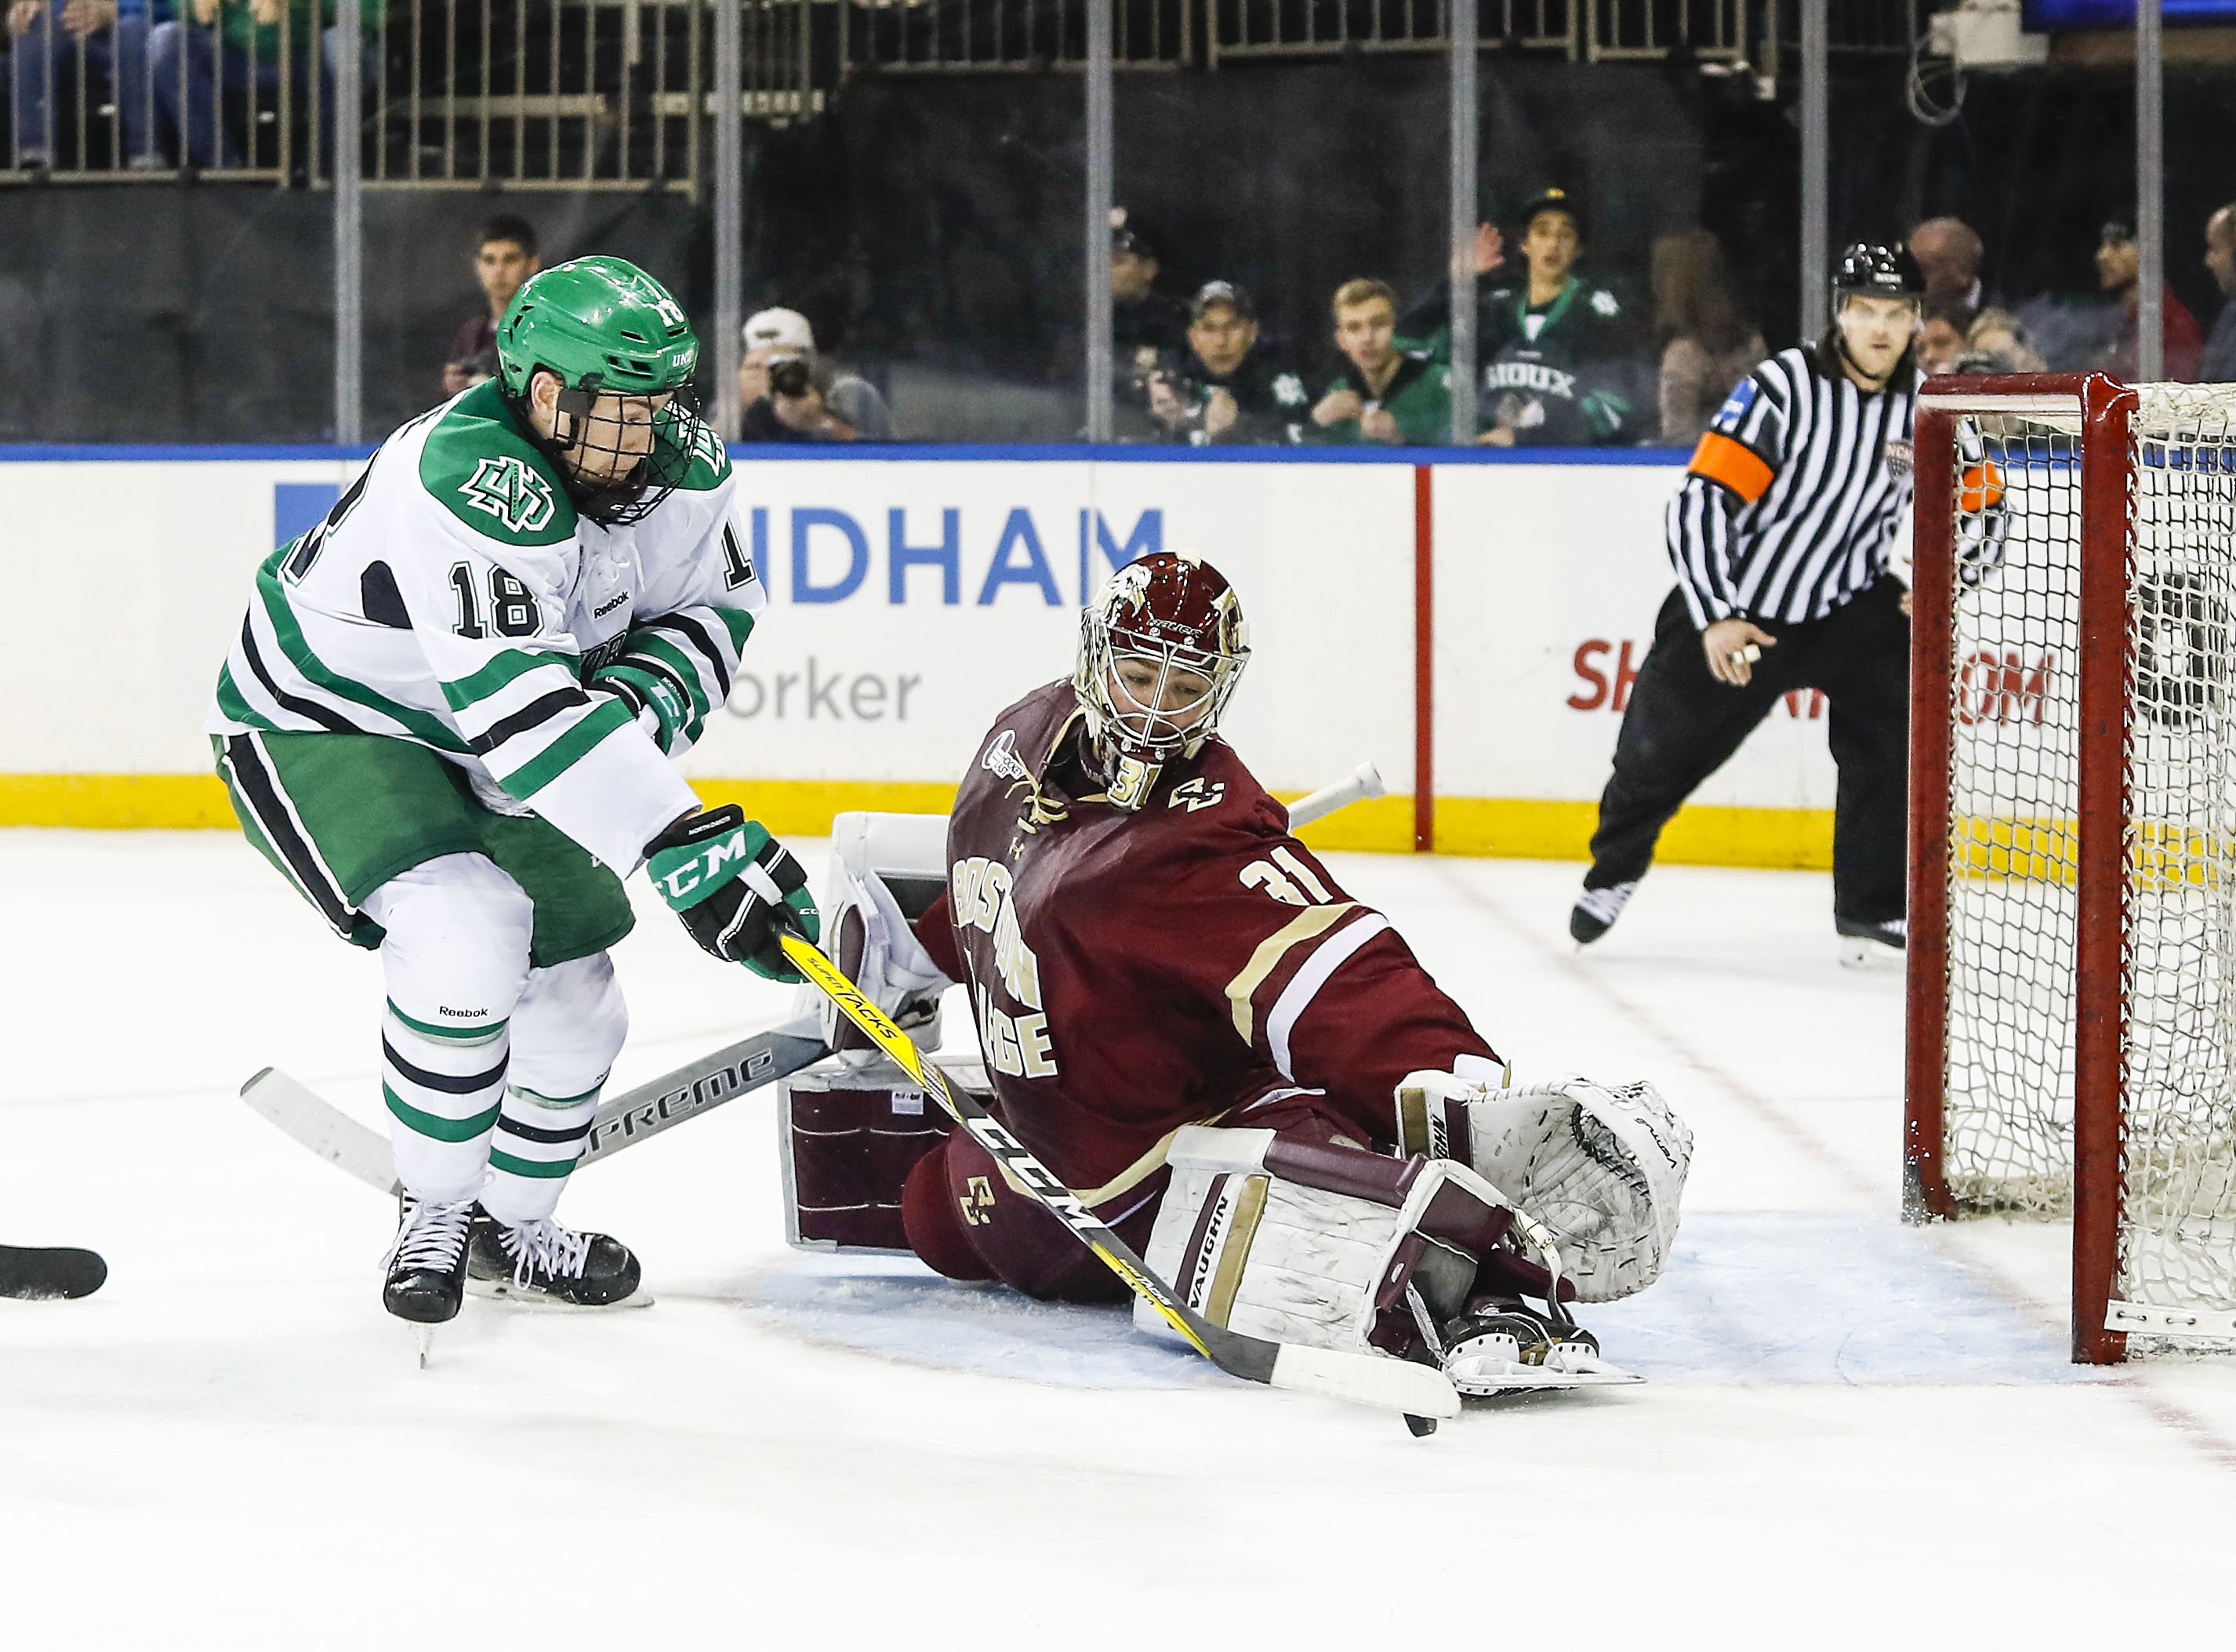 NCAA: College Hockey Showdown - North Dakota Defeats BC In New York City